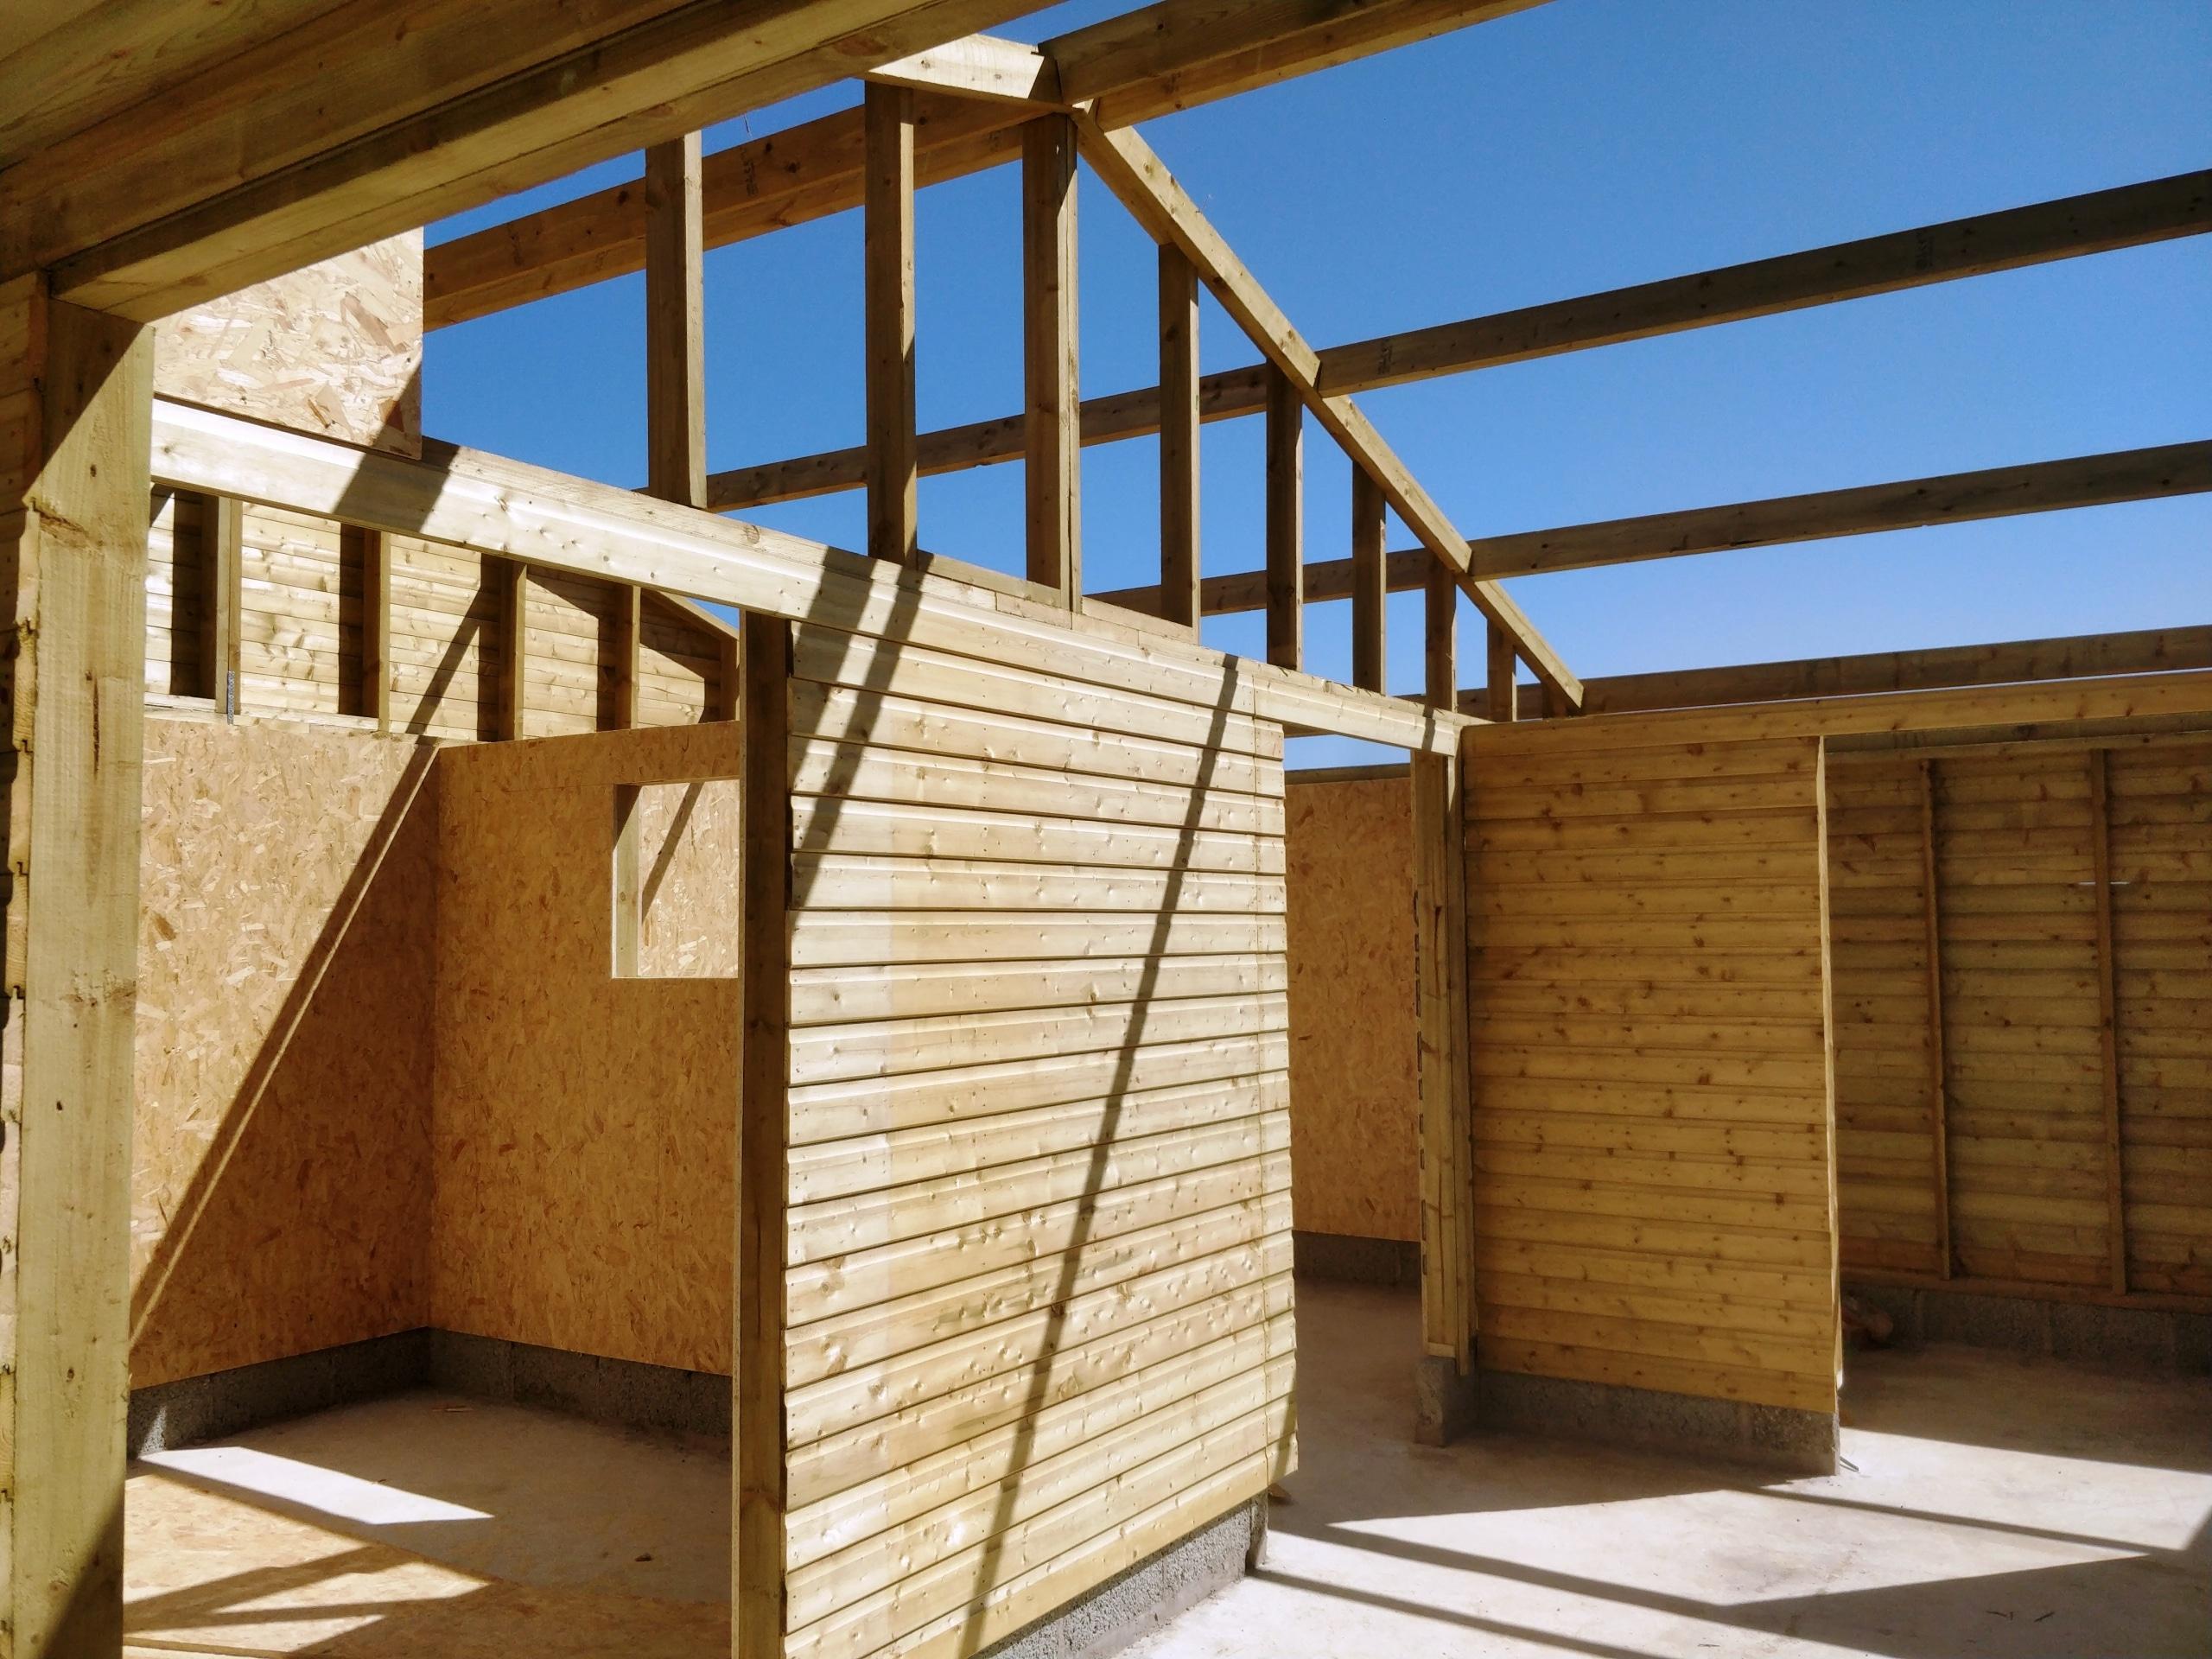 equestrian buildings ireland - internal frame work